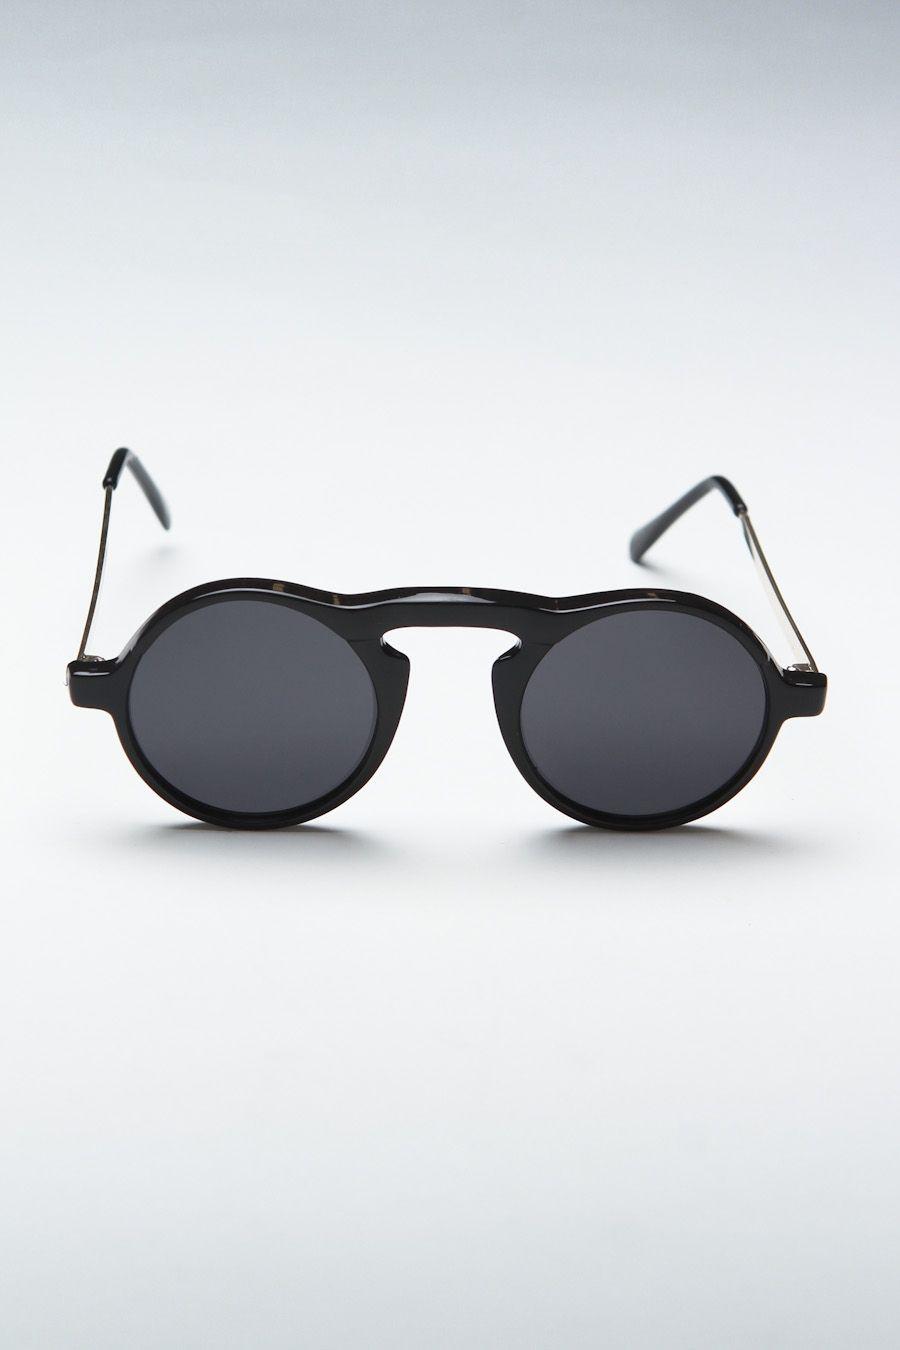 54be5418acfef cool sunglasses